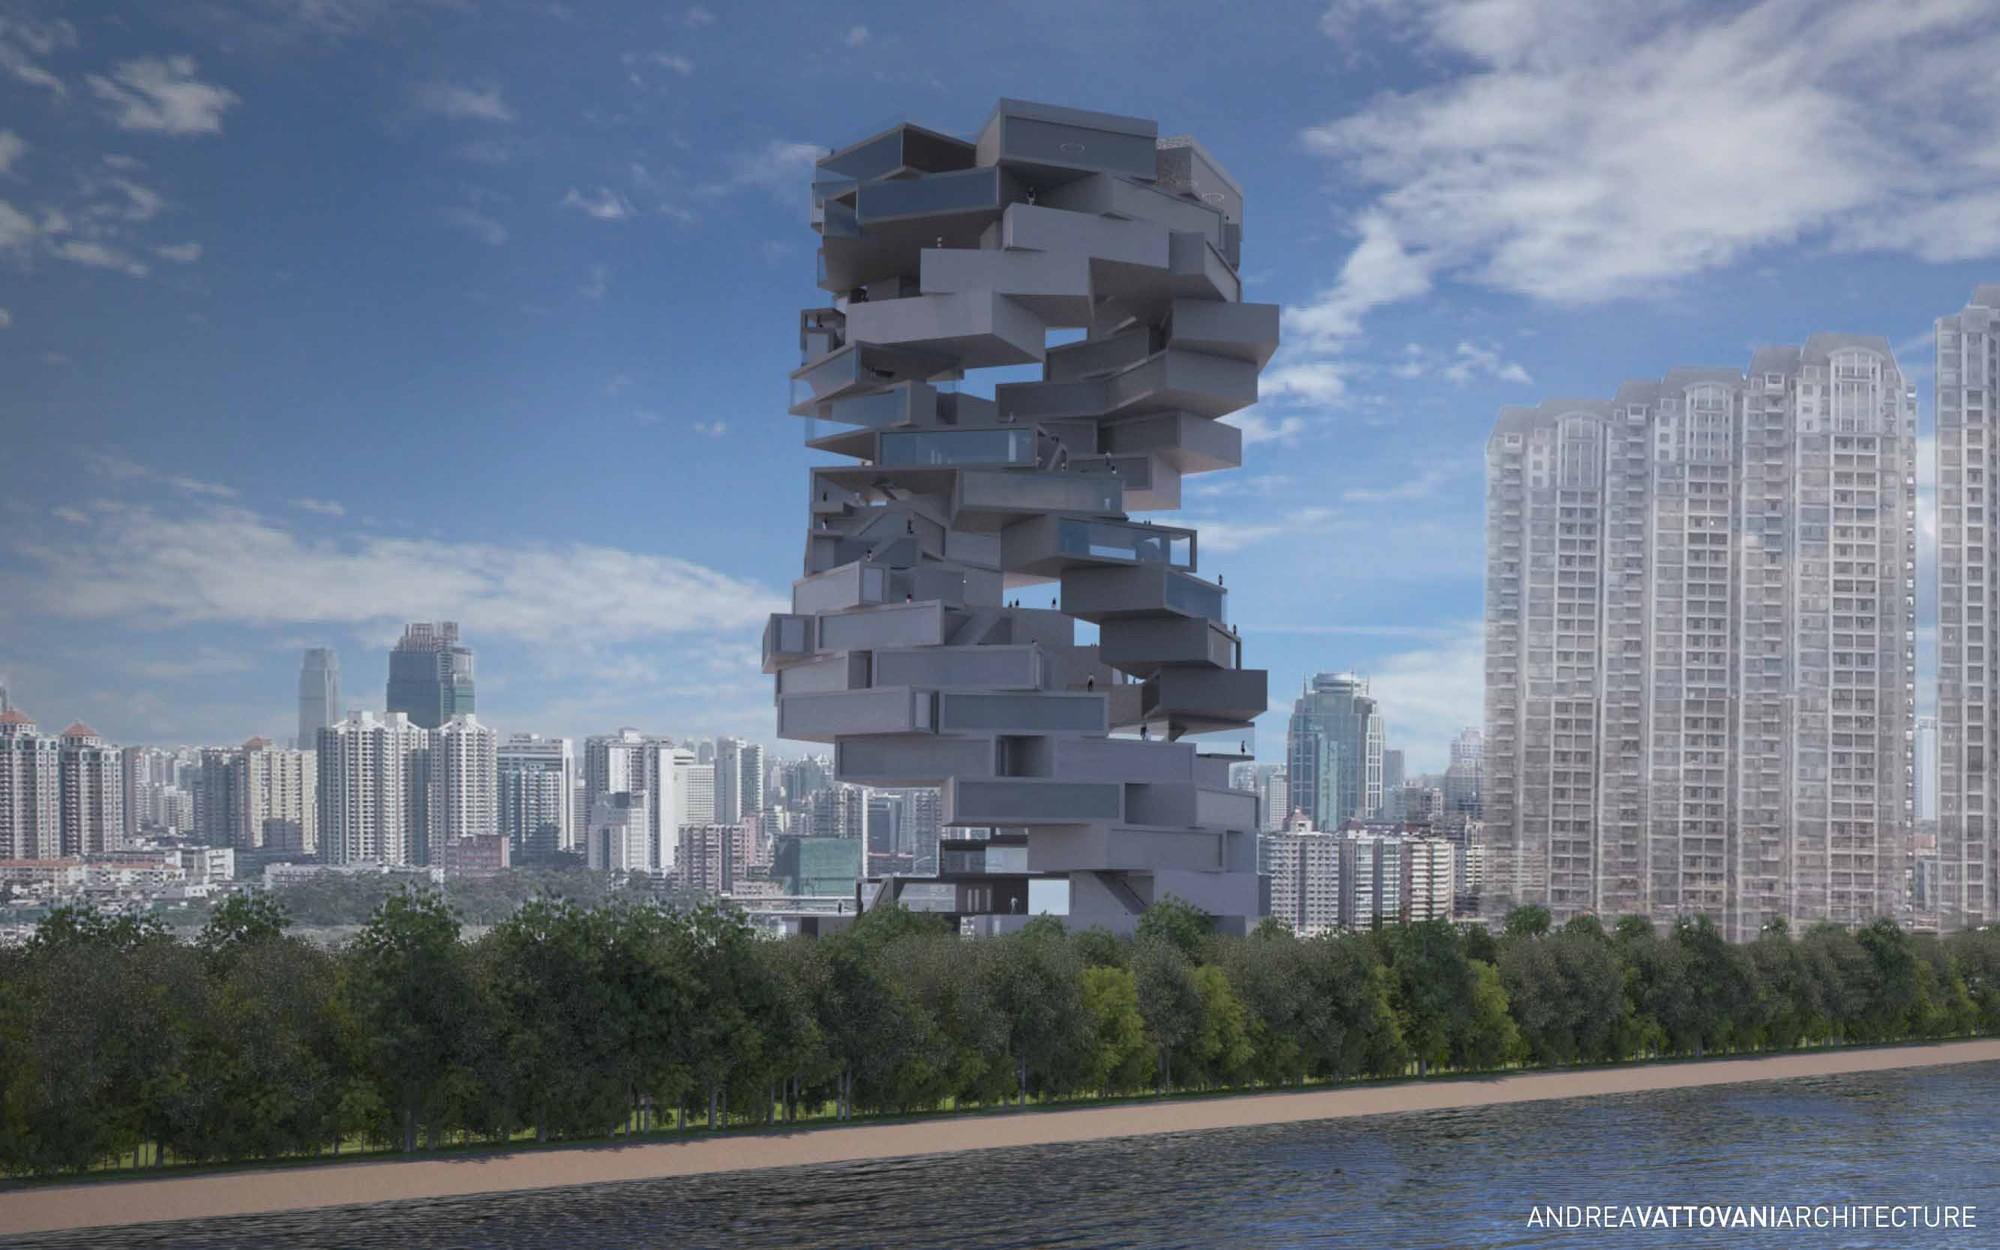 'Back2rots' Research Center Competition Entry / Andrea Vattovani Architecture, Courtesy of Andrea Vattovani Architecture